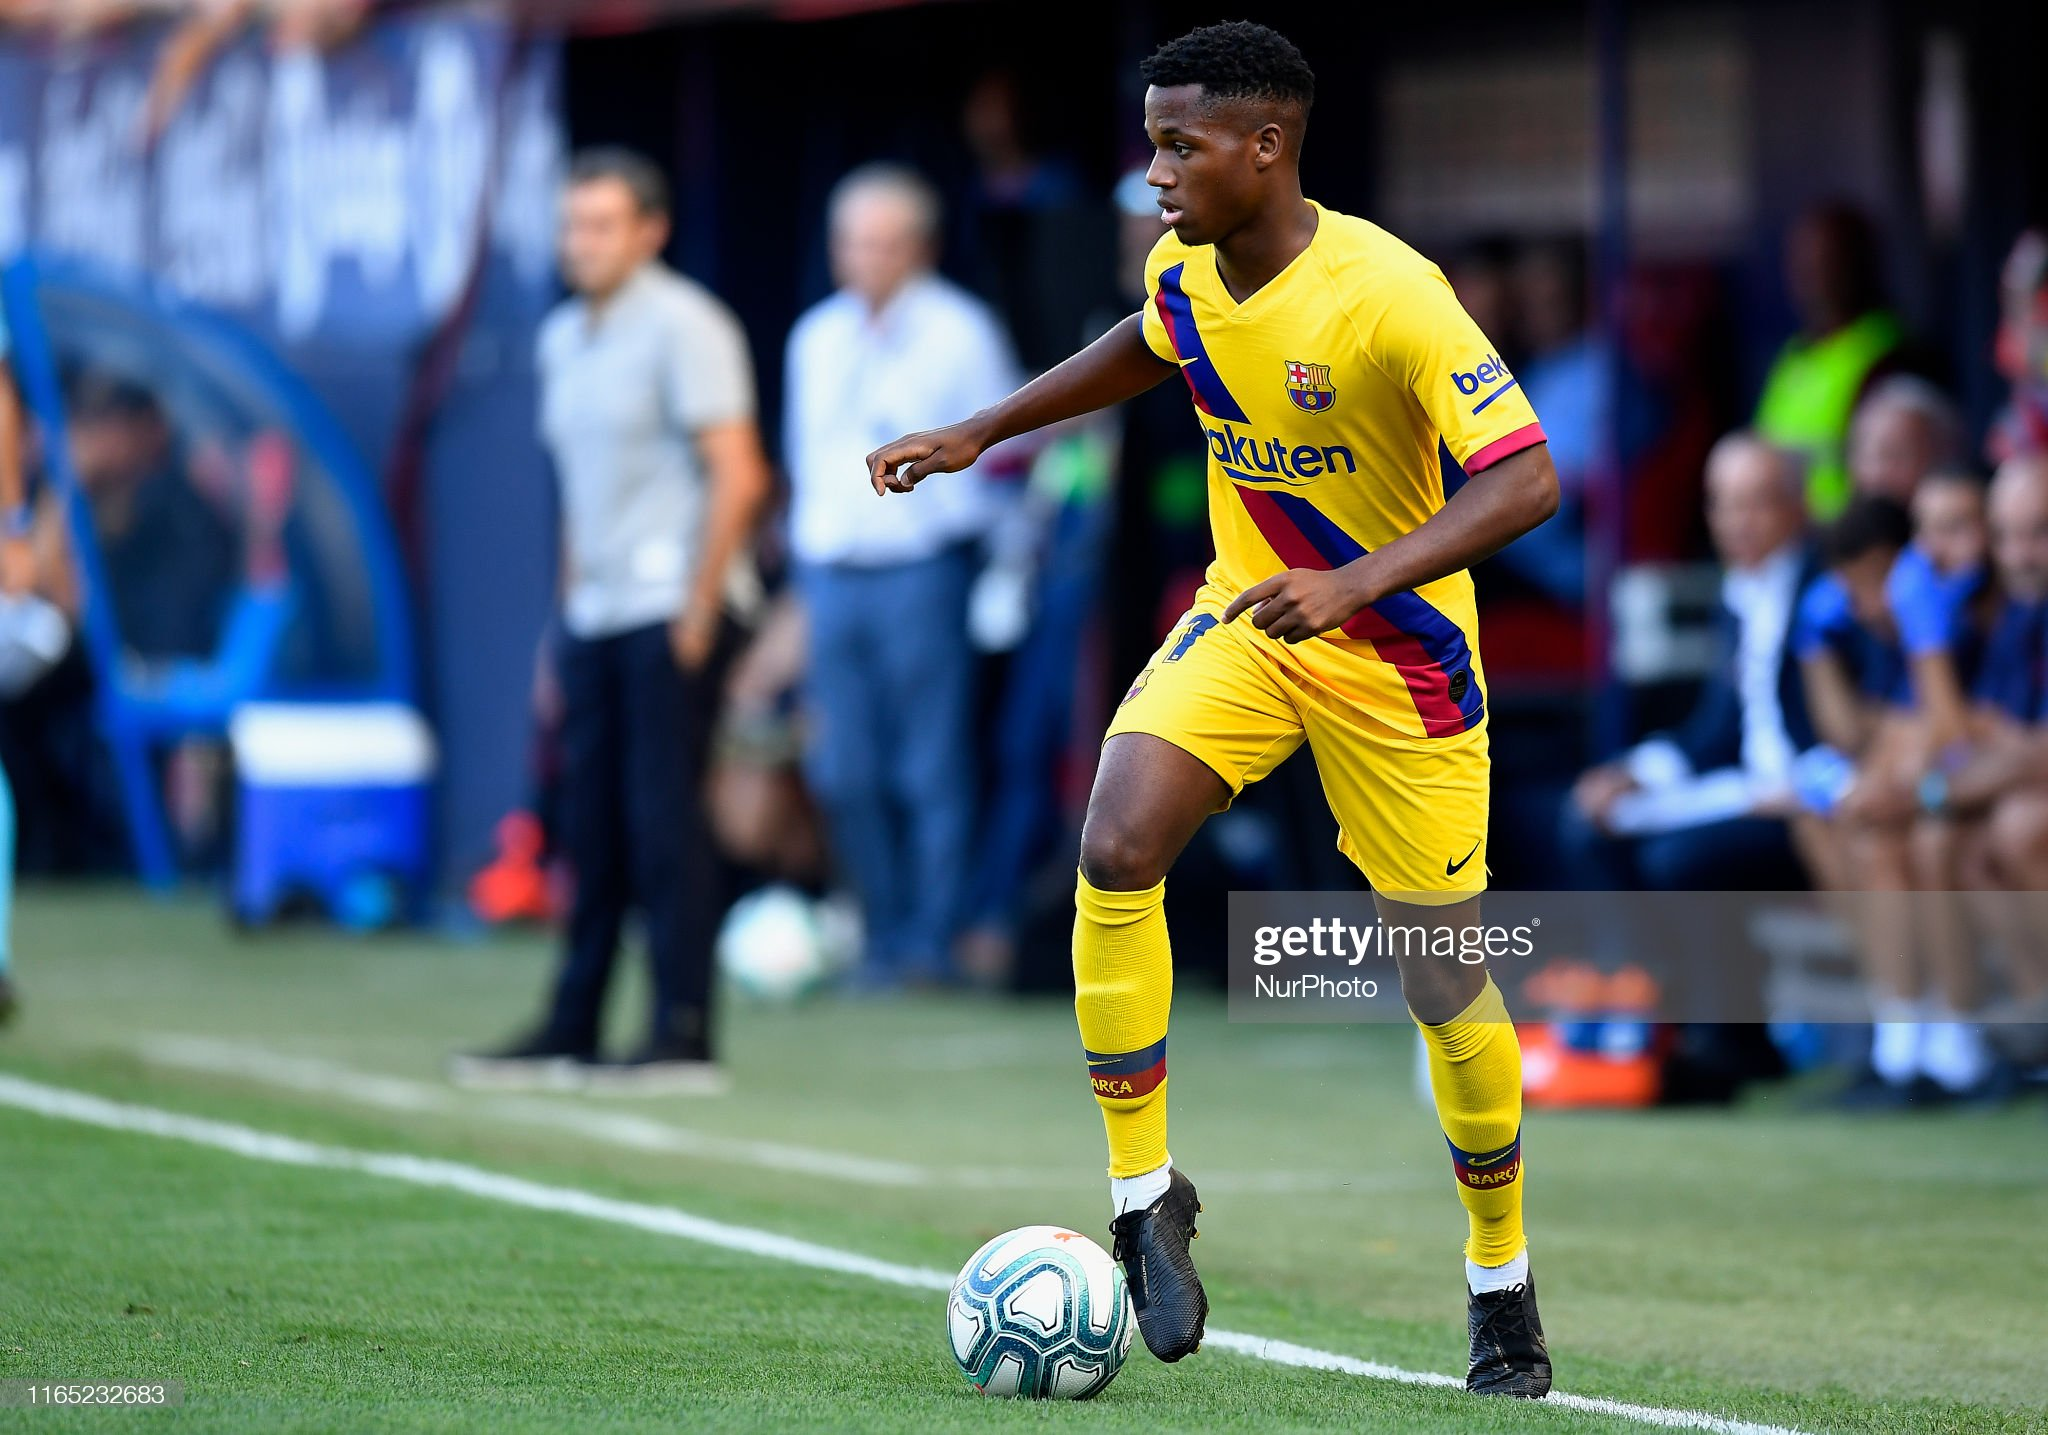 صور مباراة : أوساسونا - برشلونة 2-2 ( 31-08-2019 )  Ansu-fati-of-barcelona-in-action-during-the-liga-match-between-ca-picture-id1165232683?s=2048x2048